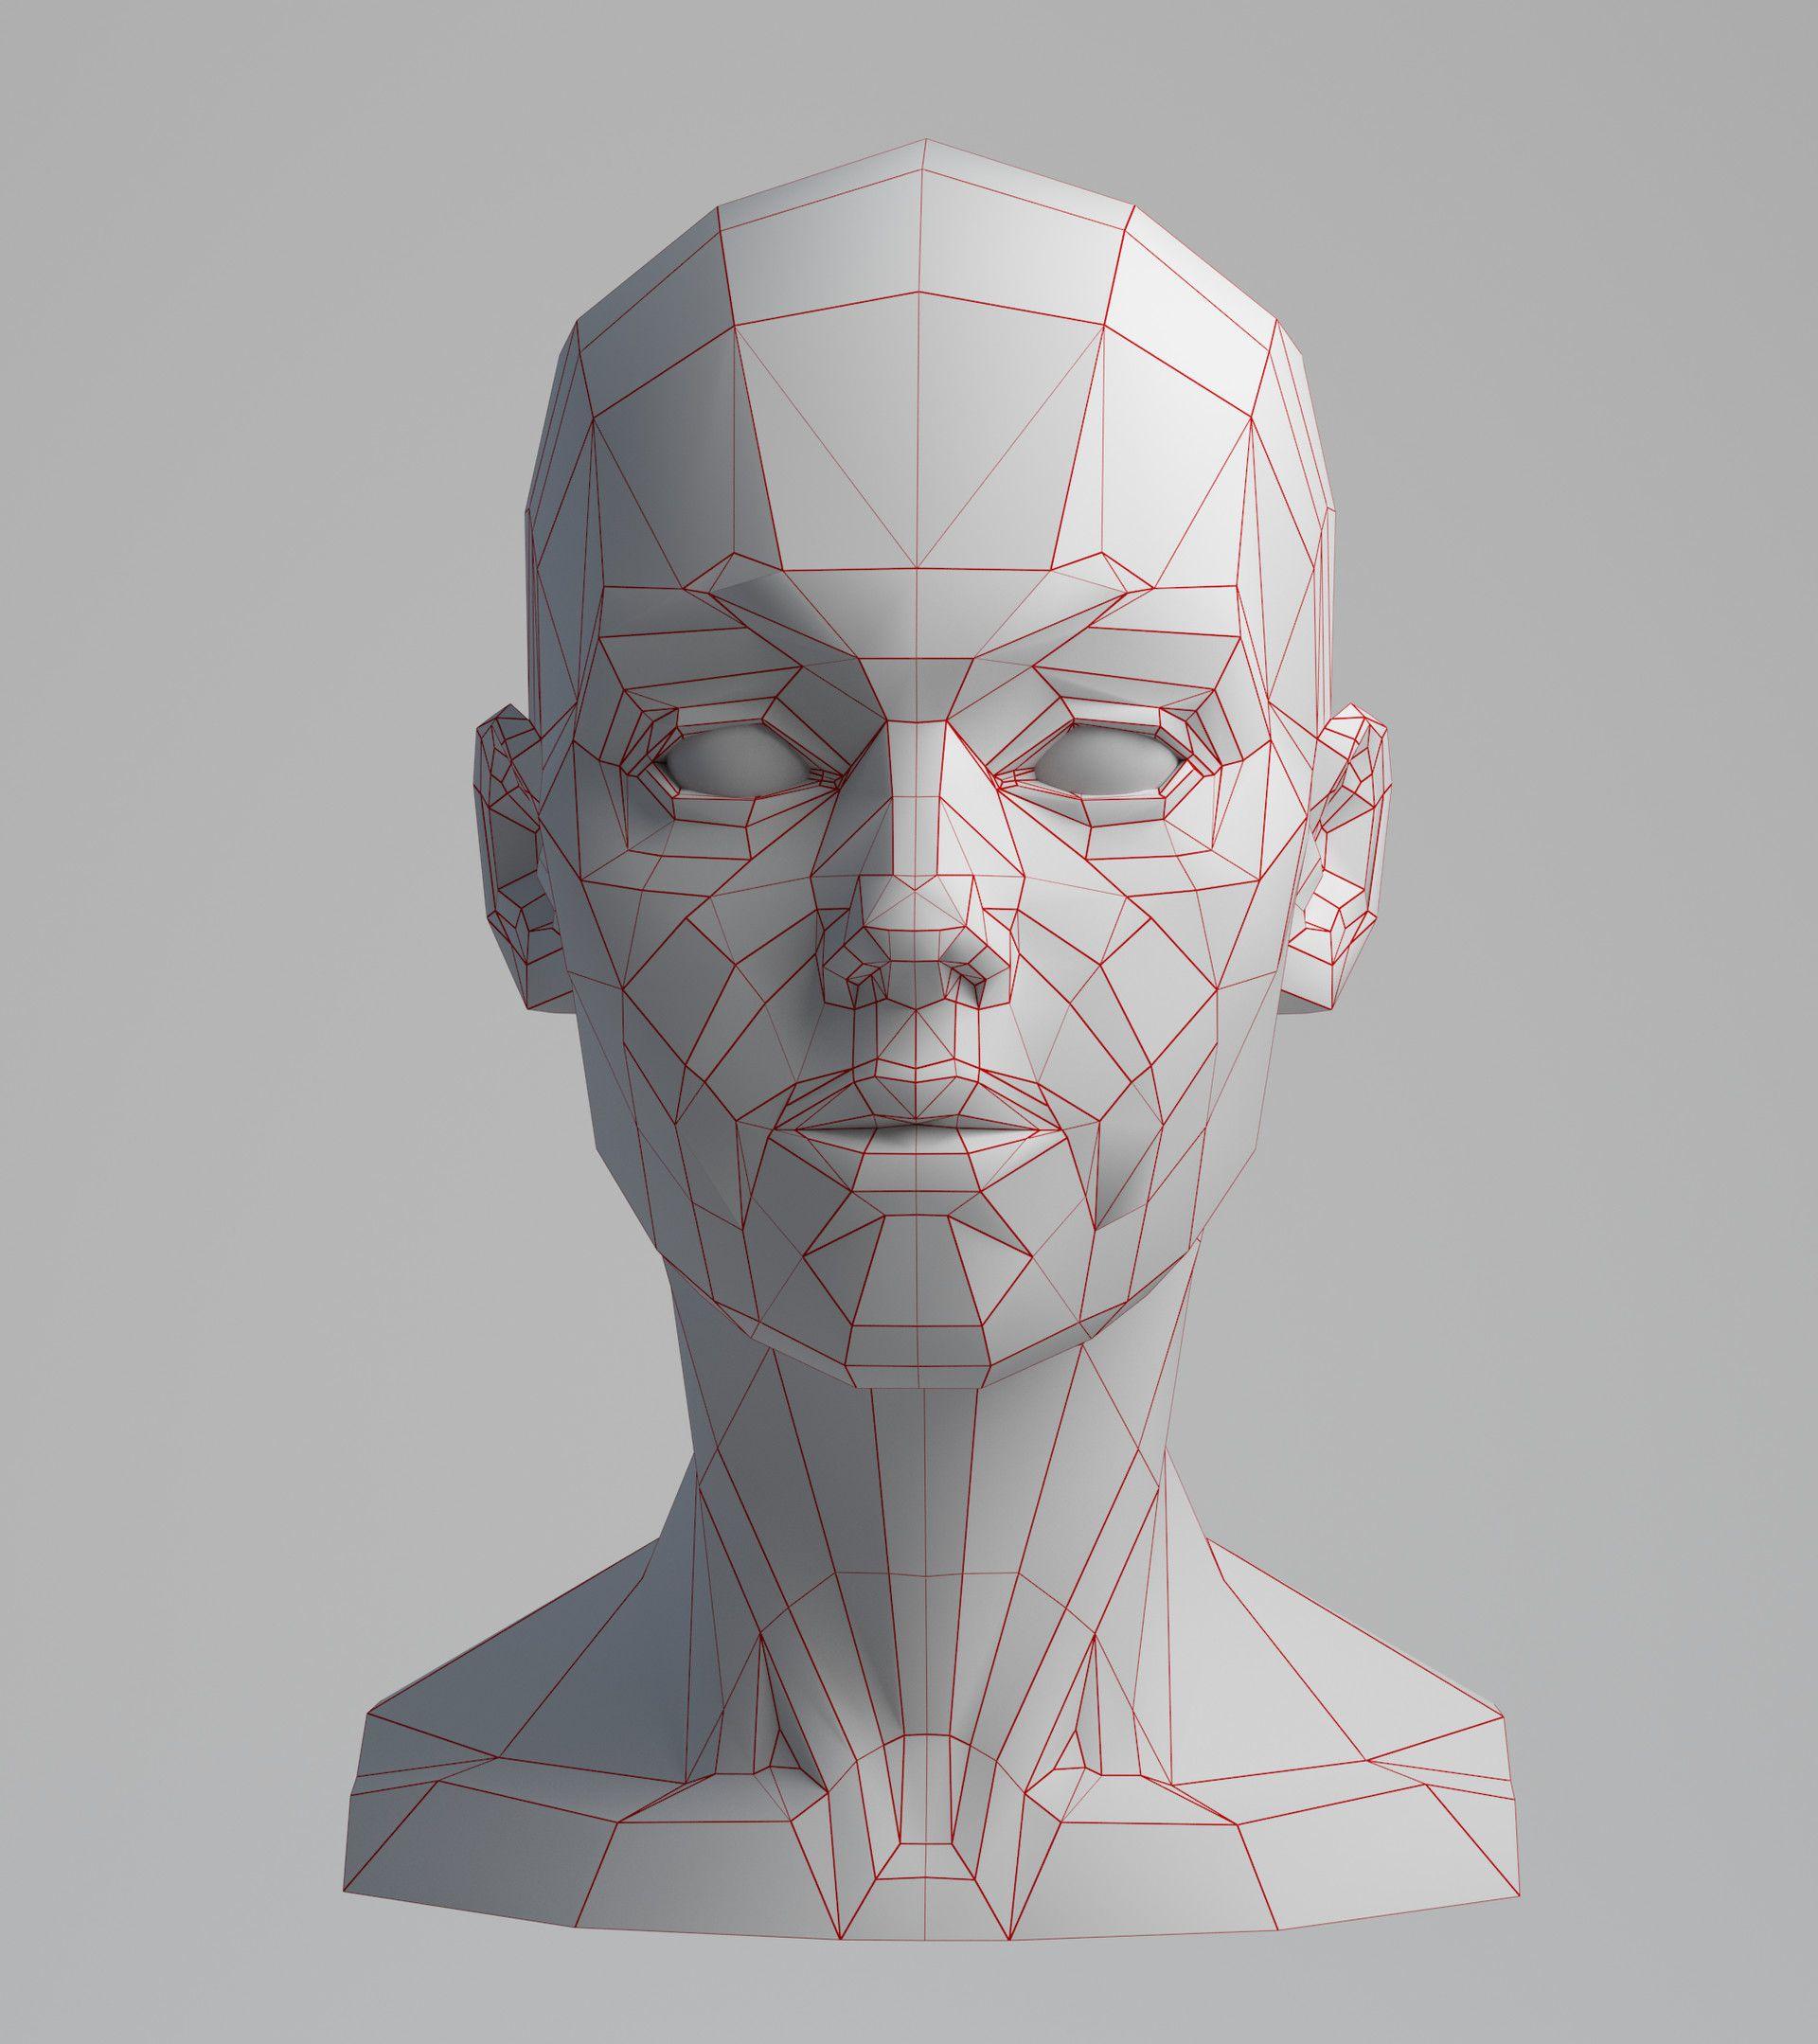 automob 3d anatomy tutorial - 736×828